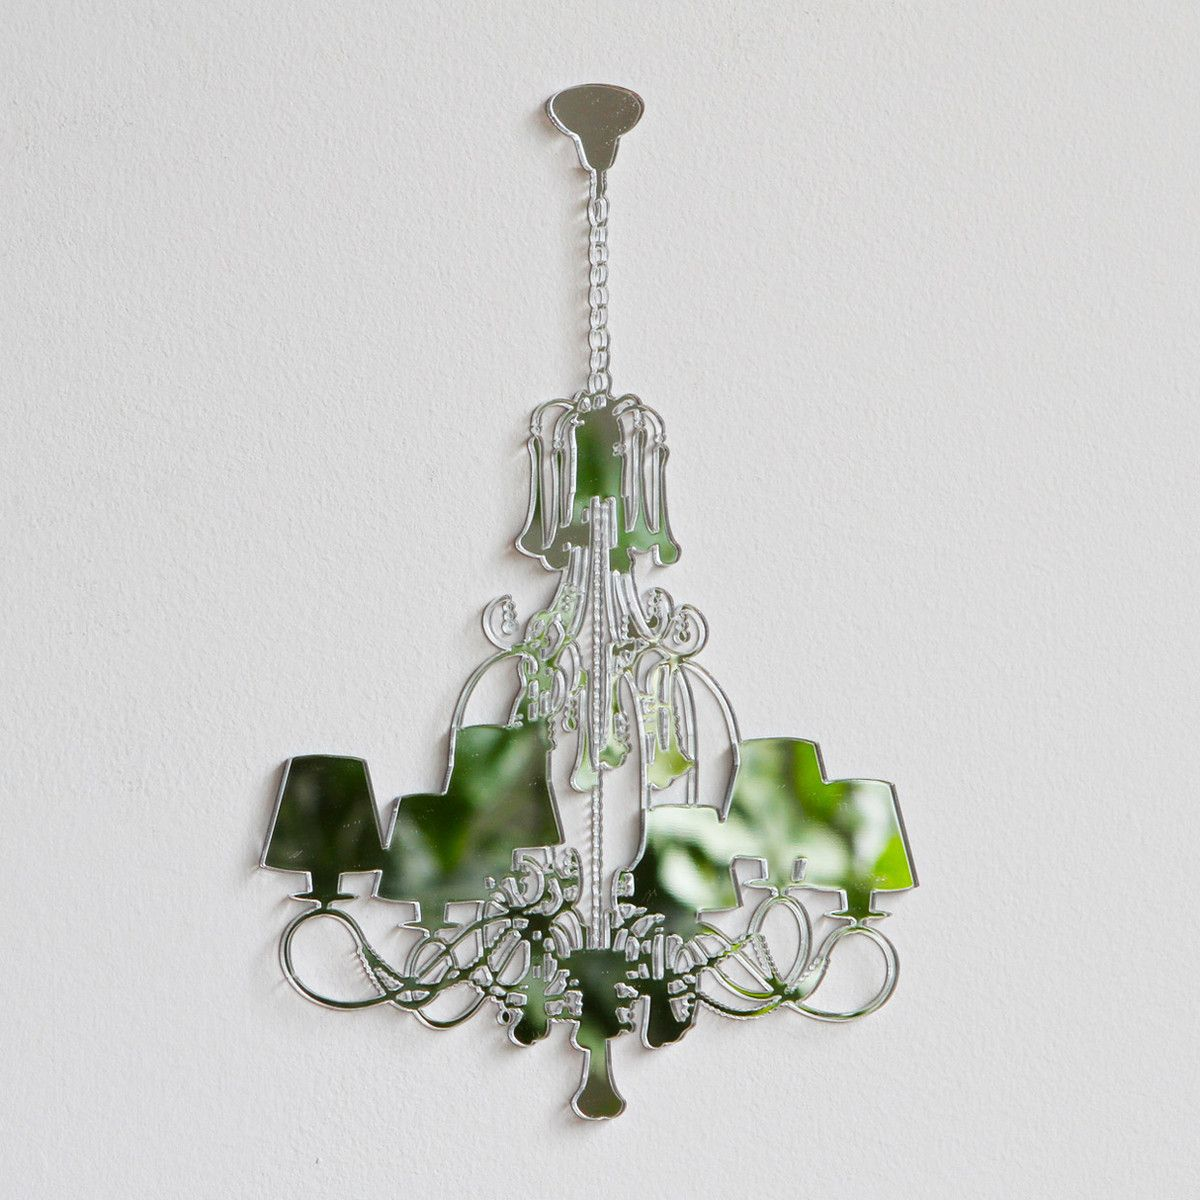 Lasercut mirror chandelier home pinterest laser cutting and lasercut mirror chandelier mozeypictures Gallery